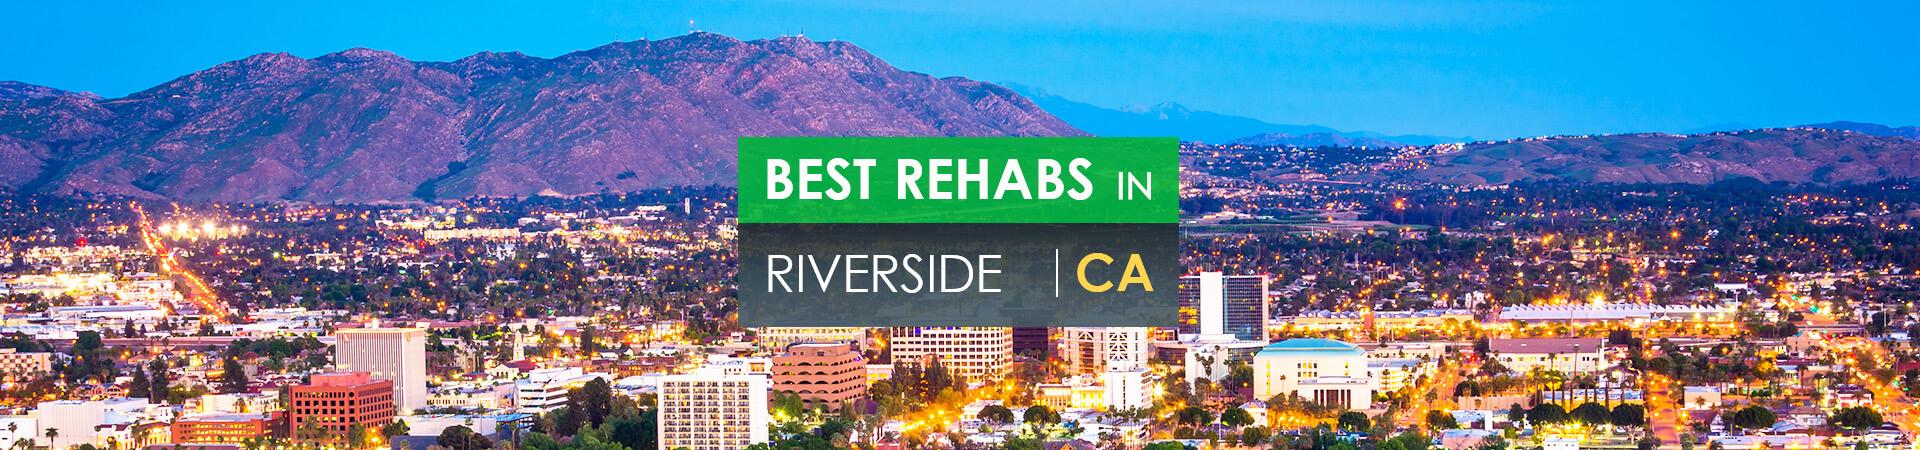 Best rehabs in Riverside, CA